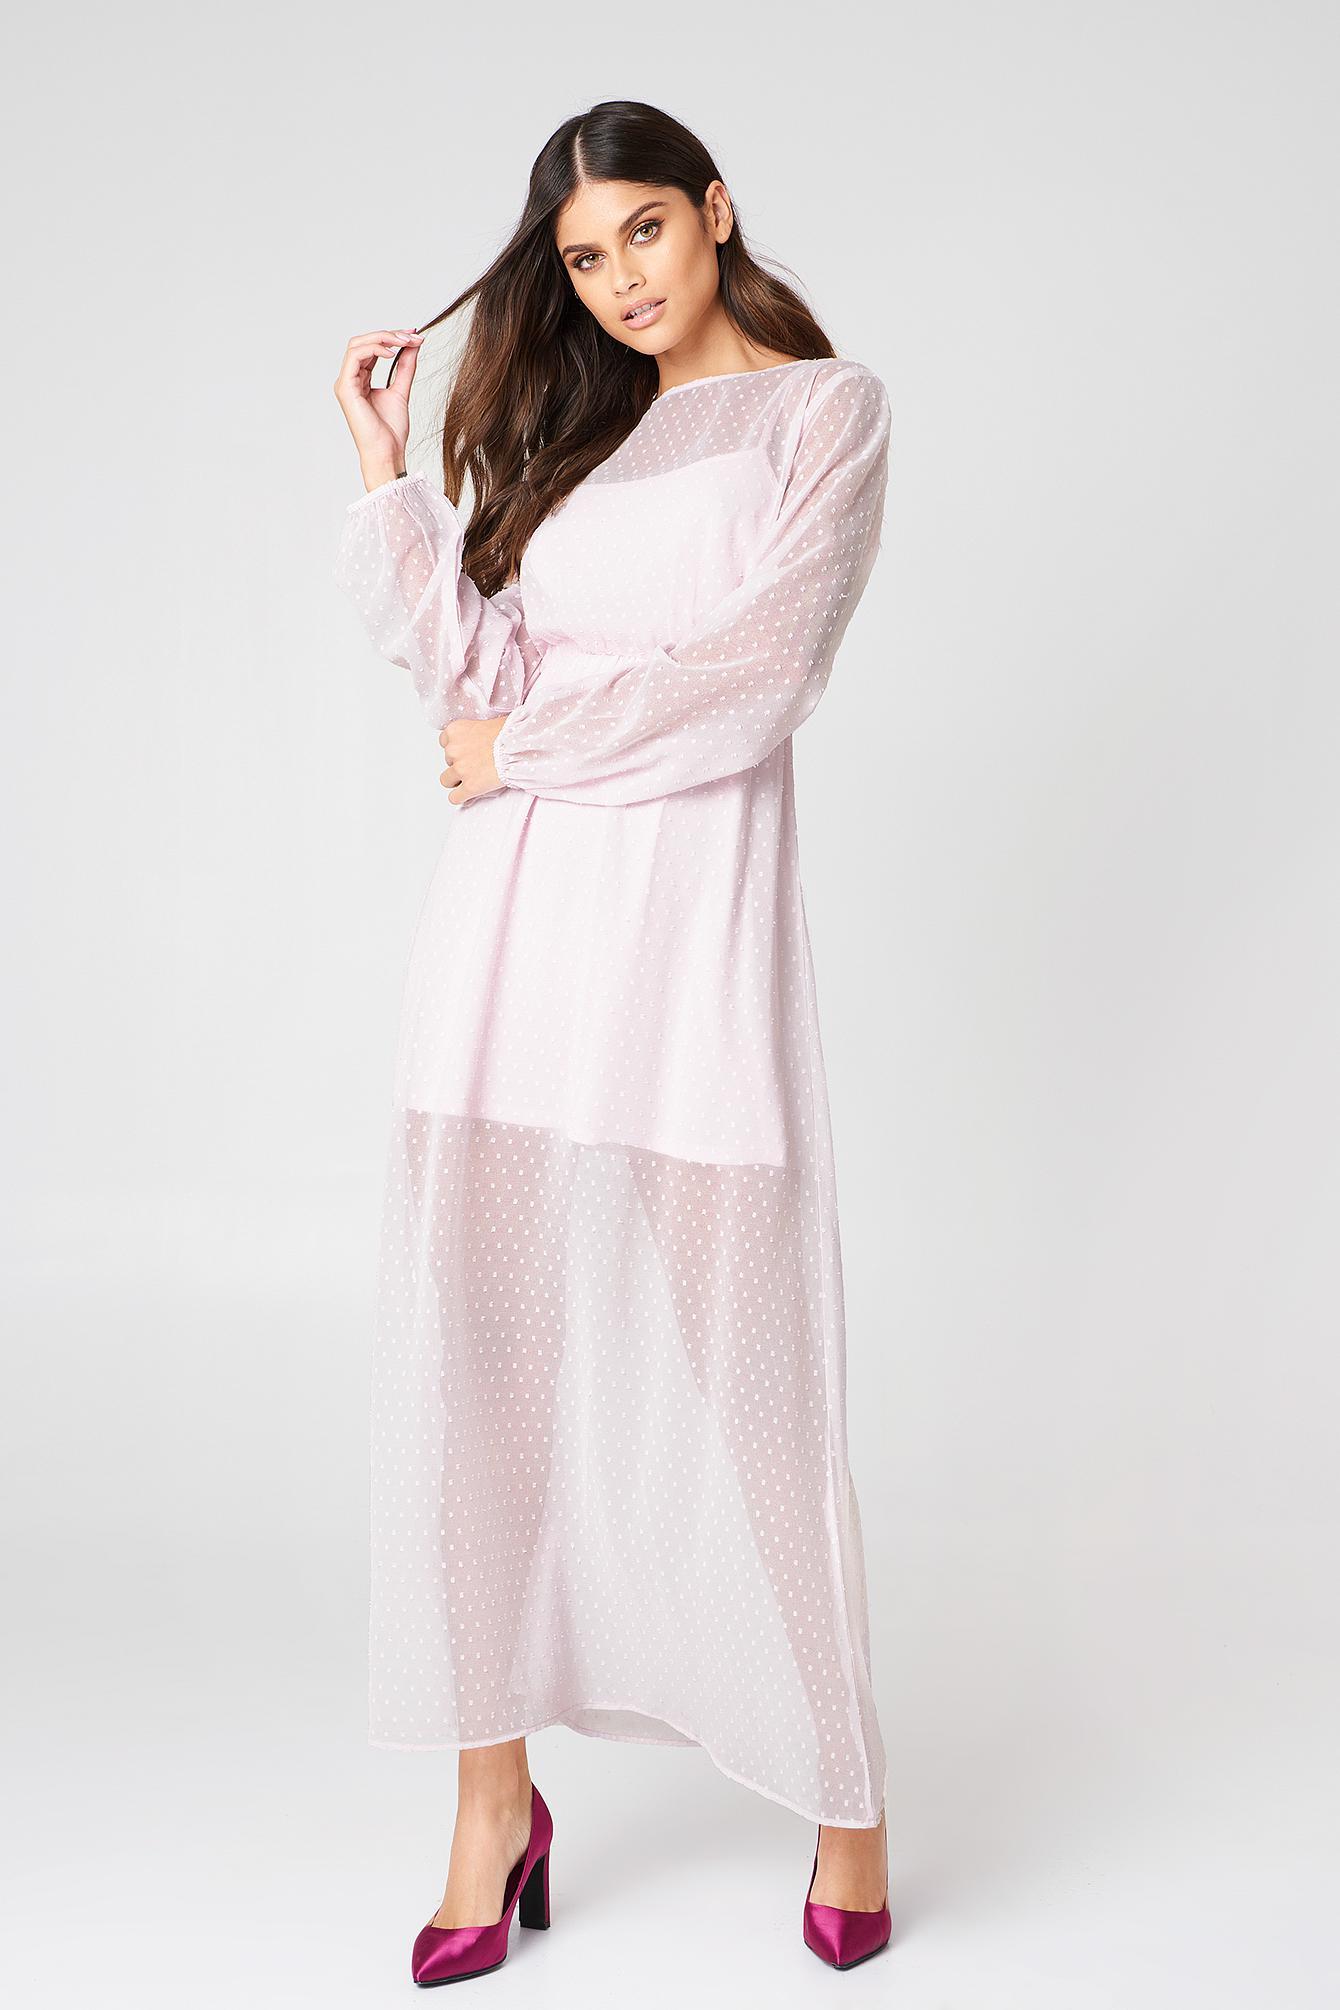 79dc9f7e248 Dusty Pink Chiffon Maxi Dress - Data Dynamic AG